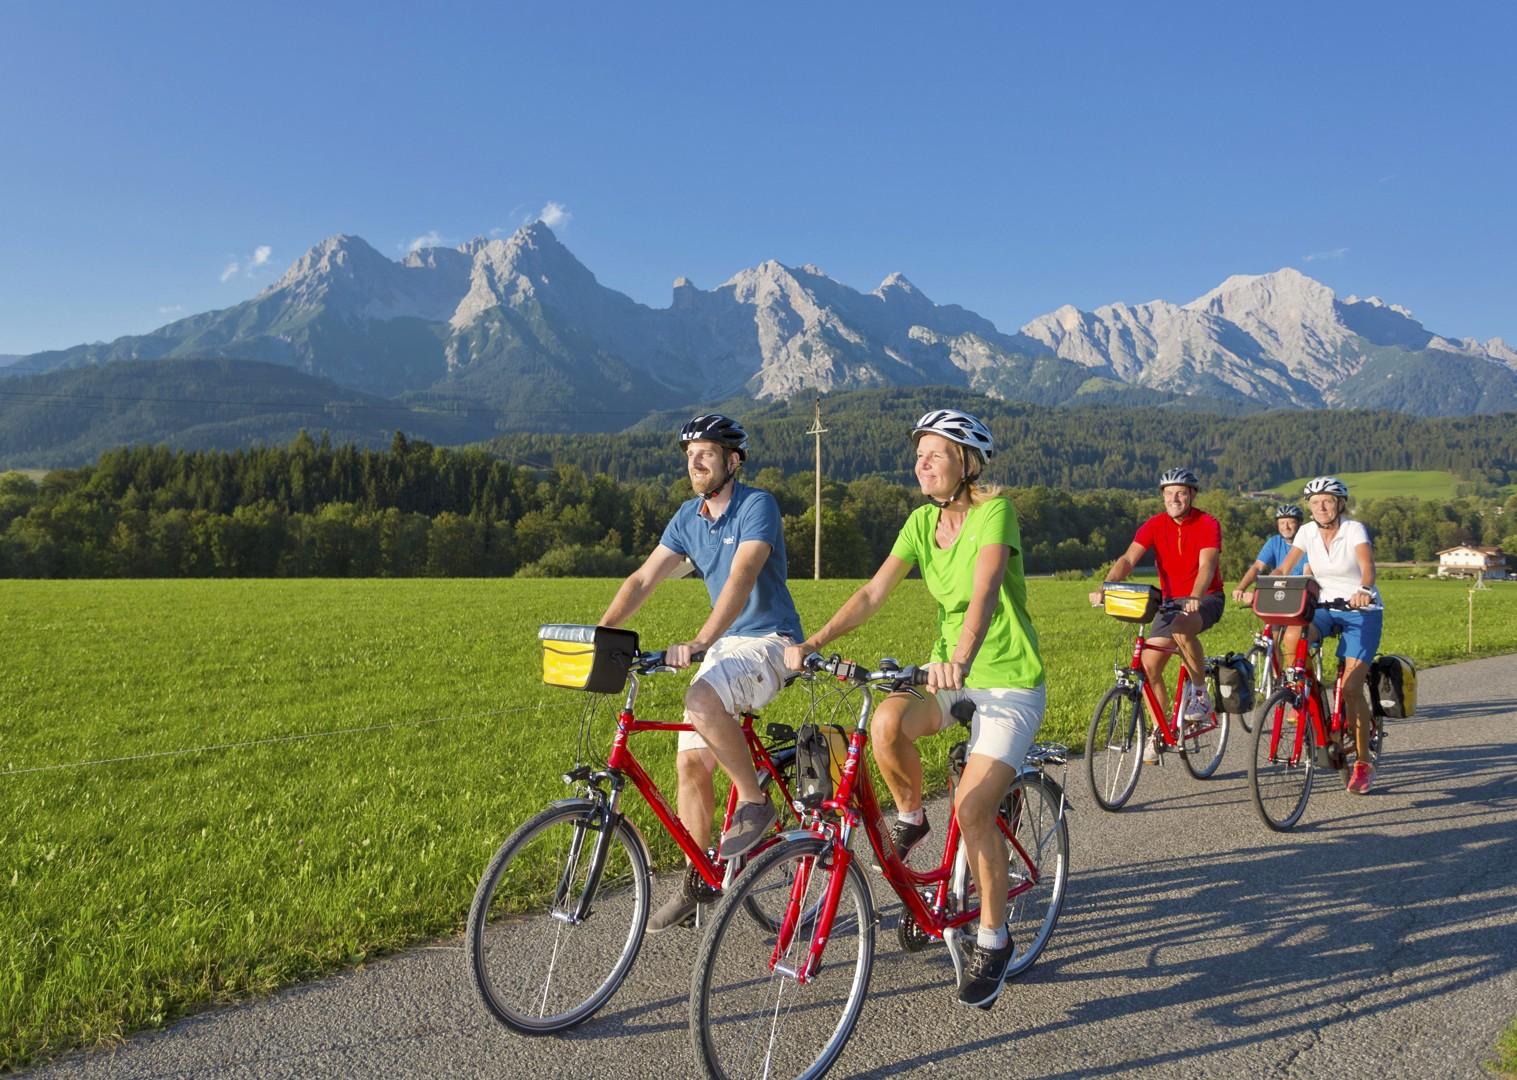 austria-panoramic-mountain-views-leisure-bike-holiday.jpg - Austria - Tauern Valleys - Self-Guided Leisure Cycling Holiday - Leisure Cycling